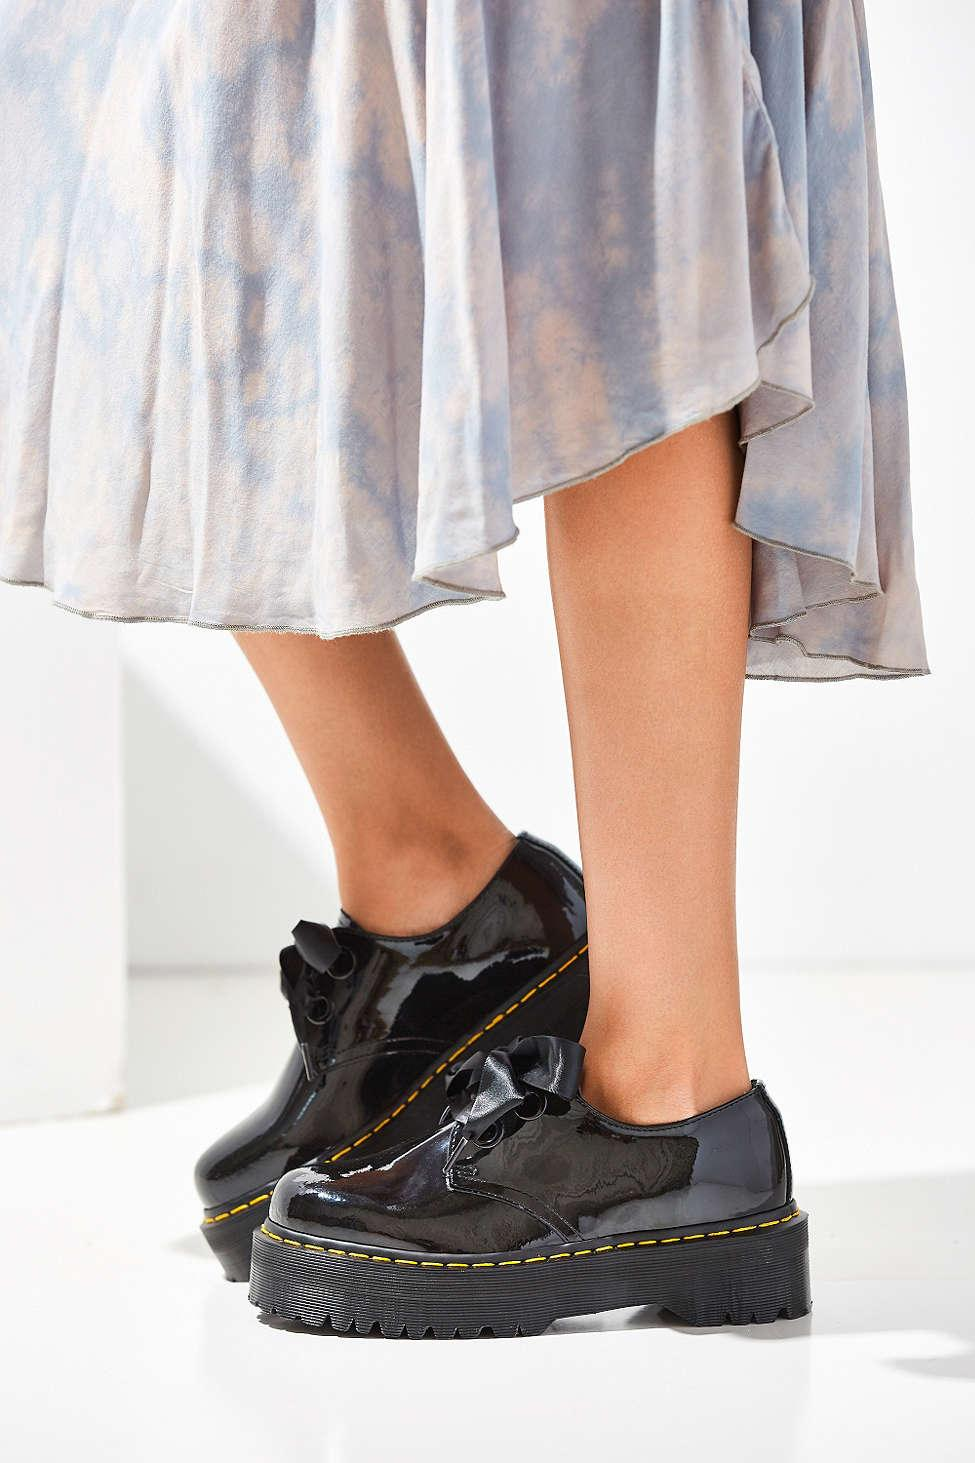 d68d9f6da6a8 Lyst - Dr. Martens Holly Patent Leather Platform Oxford in Black